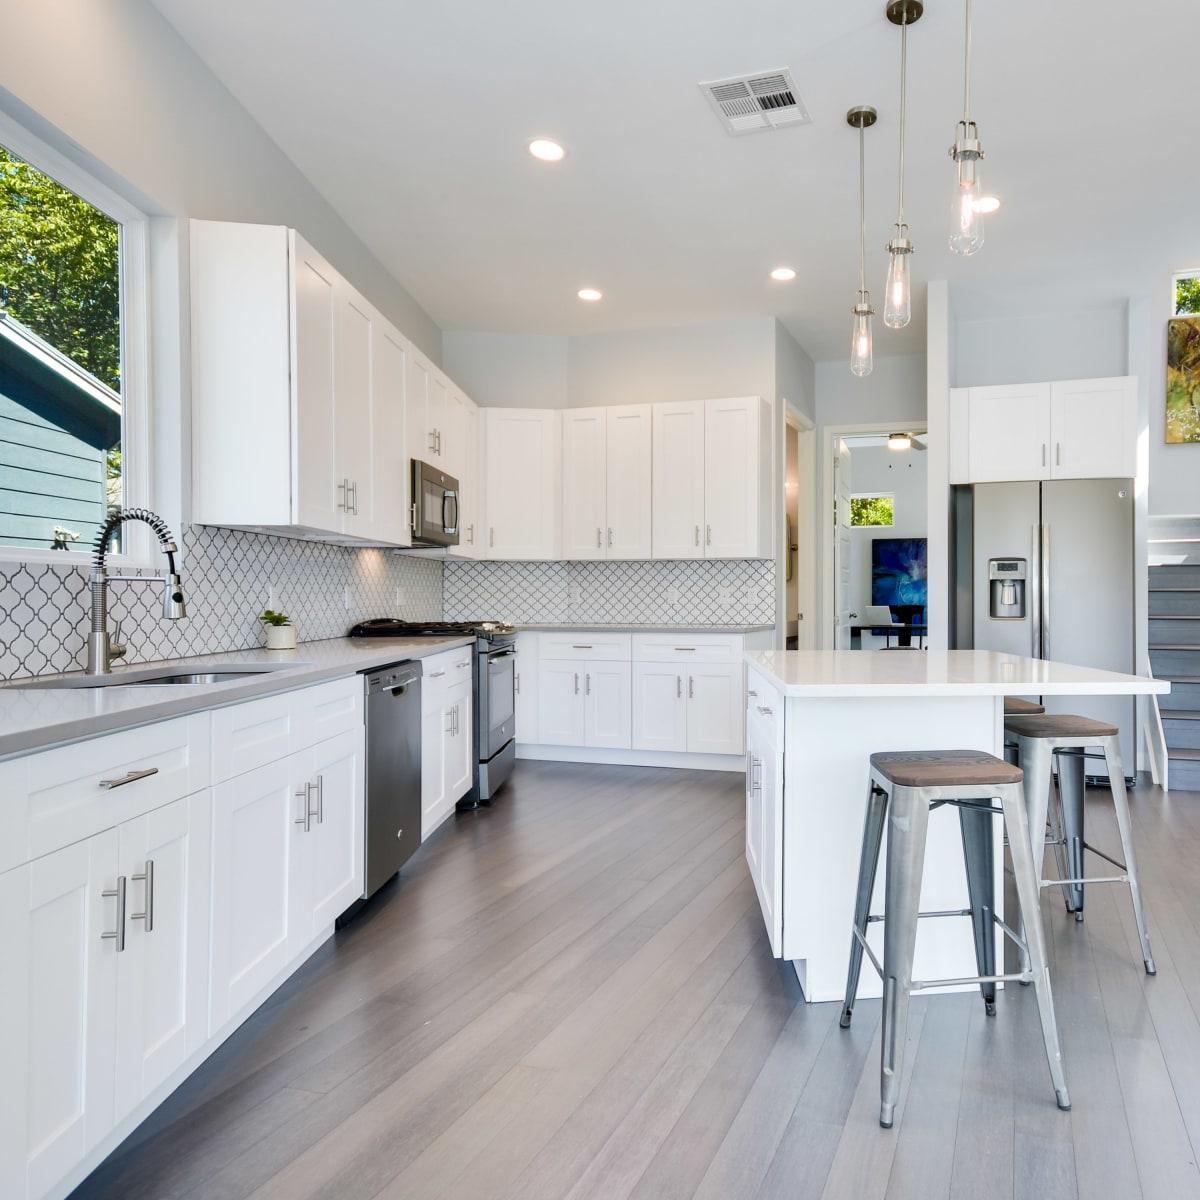 2406 E 16th St Austin house for sale kitchen